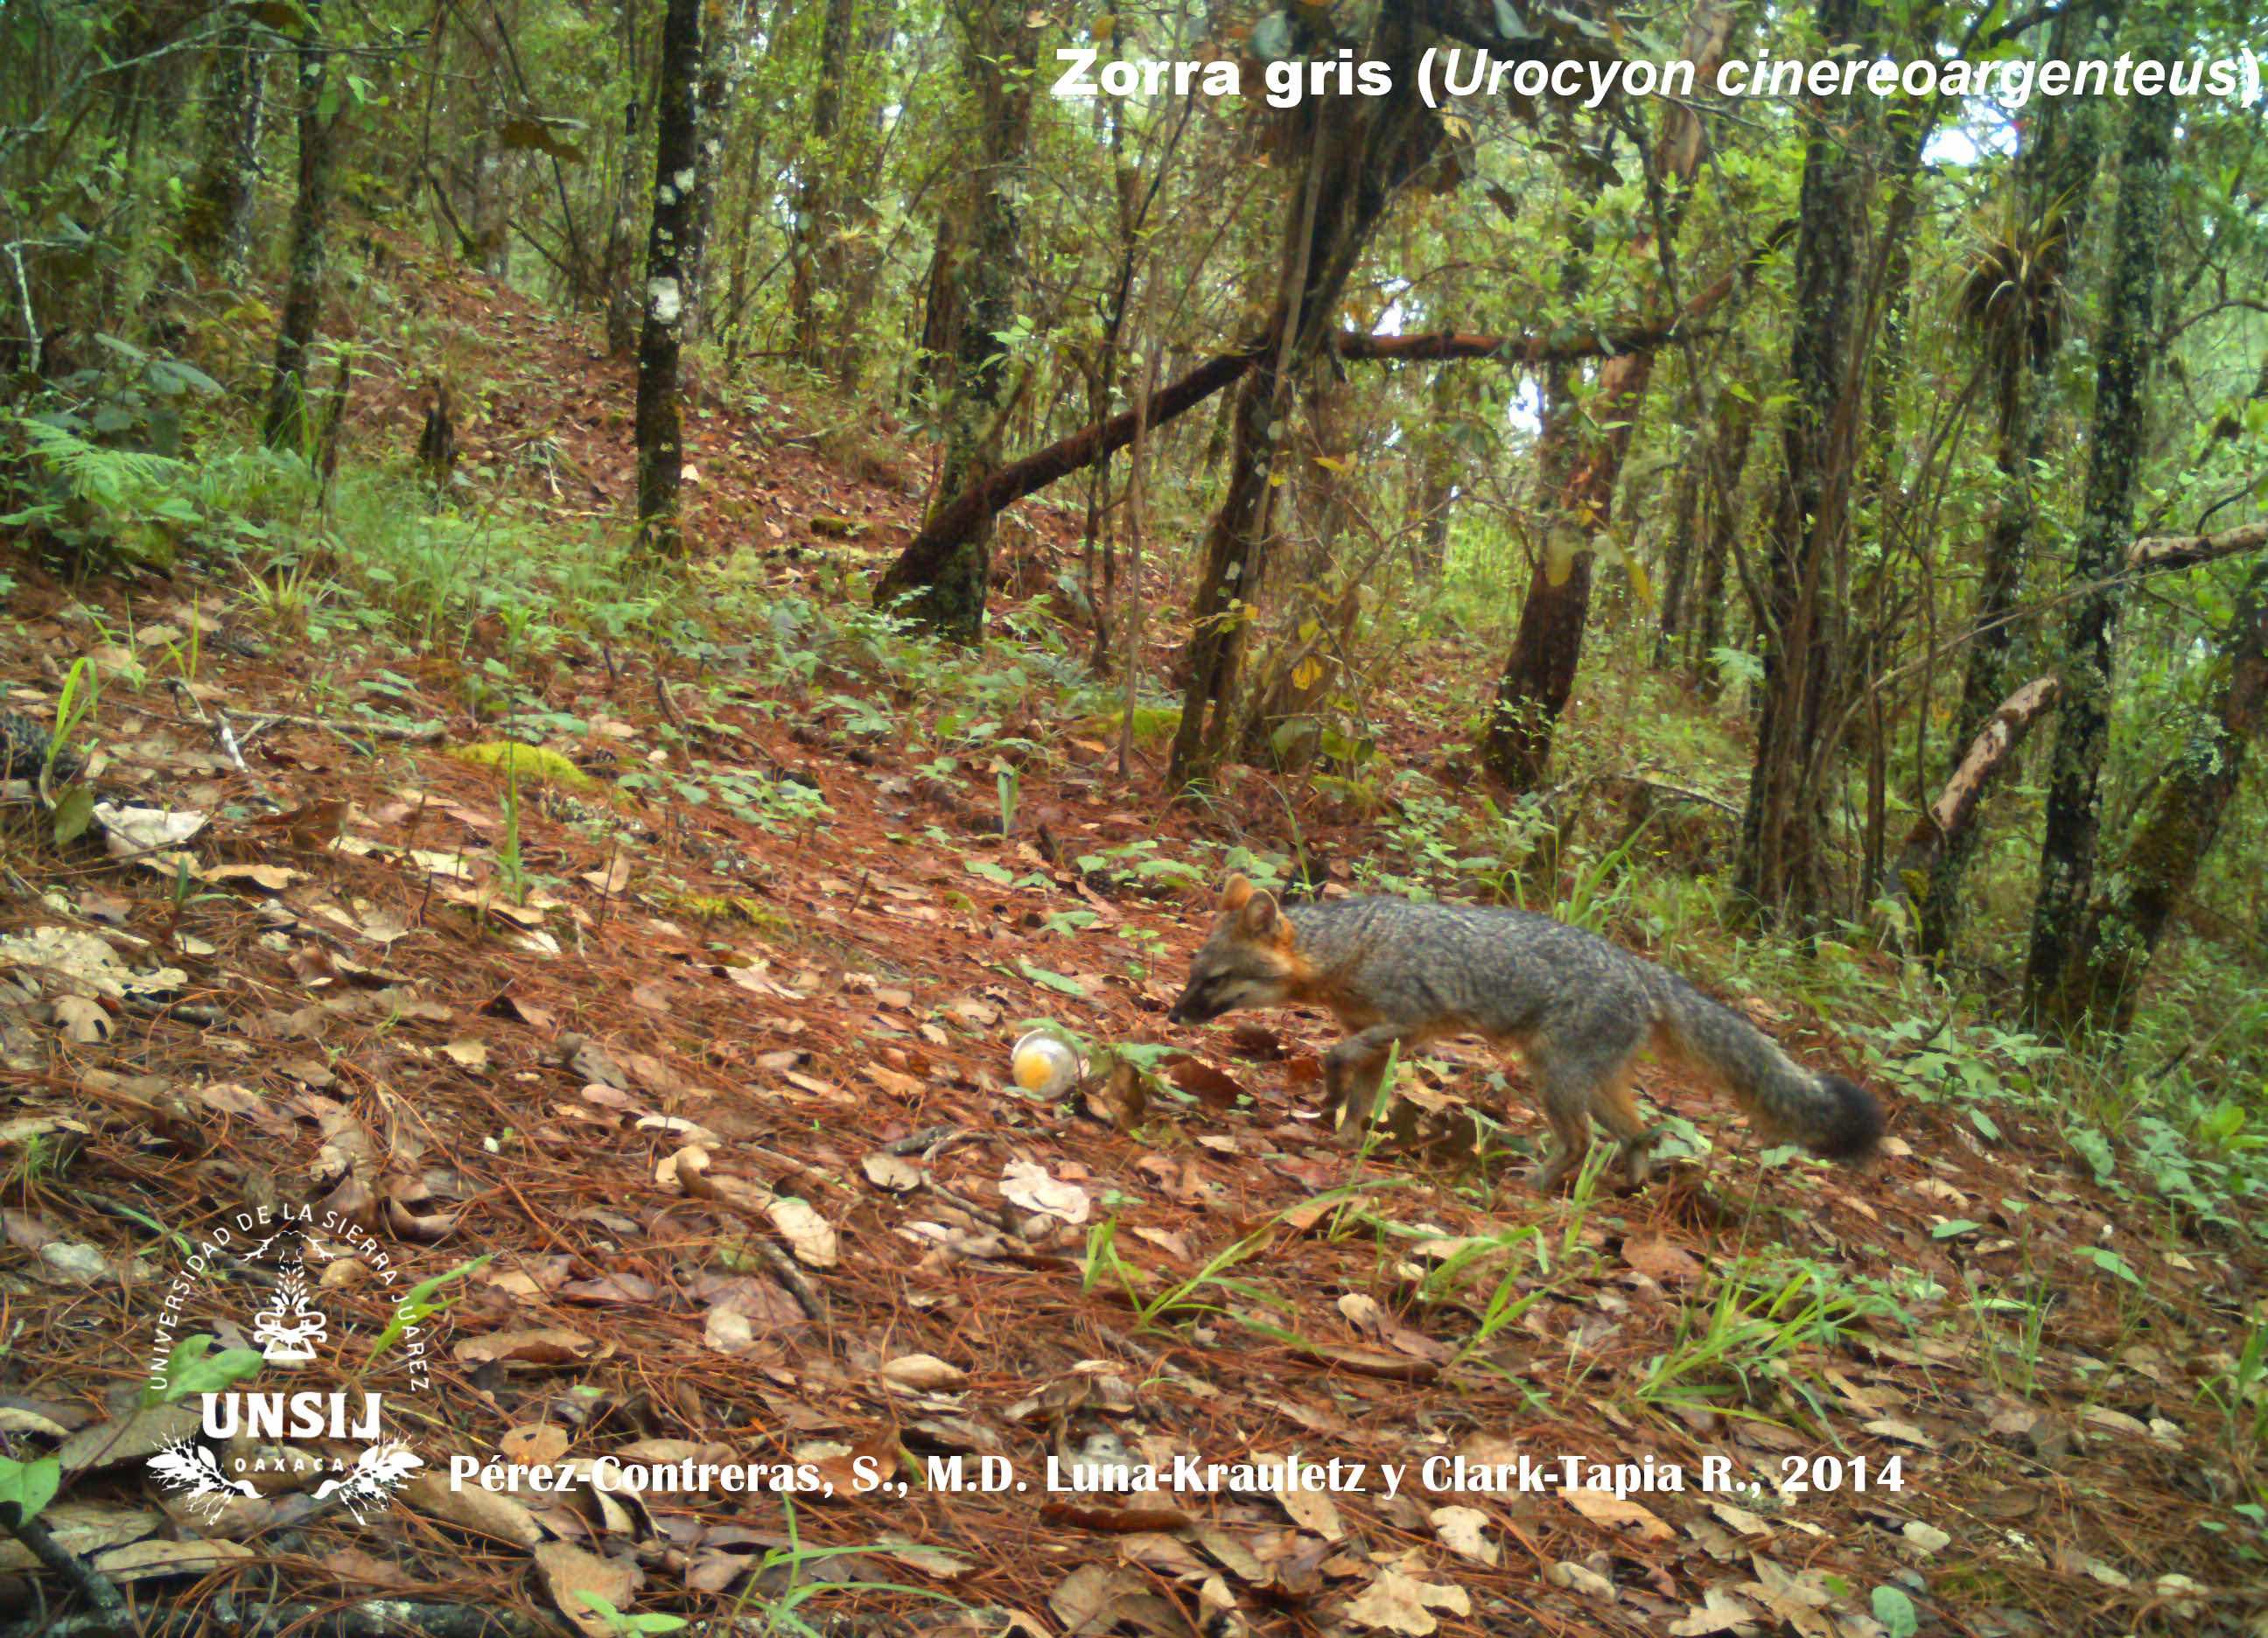 Fauna de bosques comunitarios